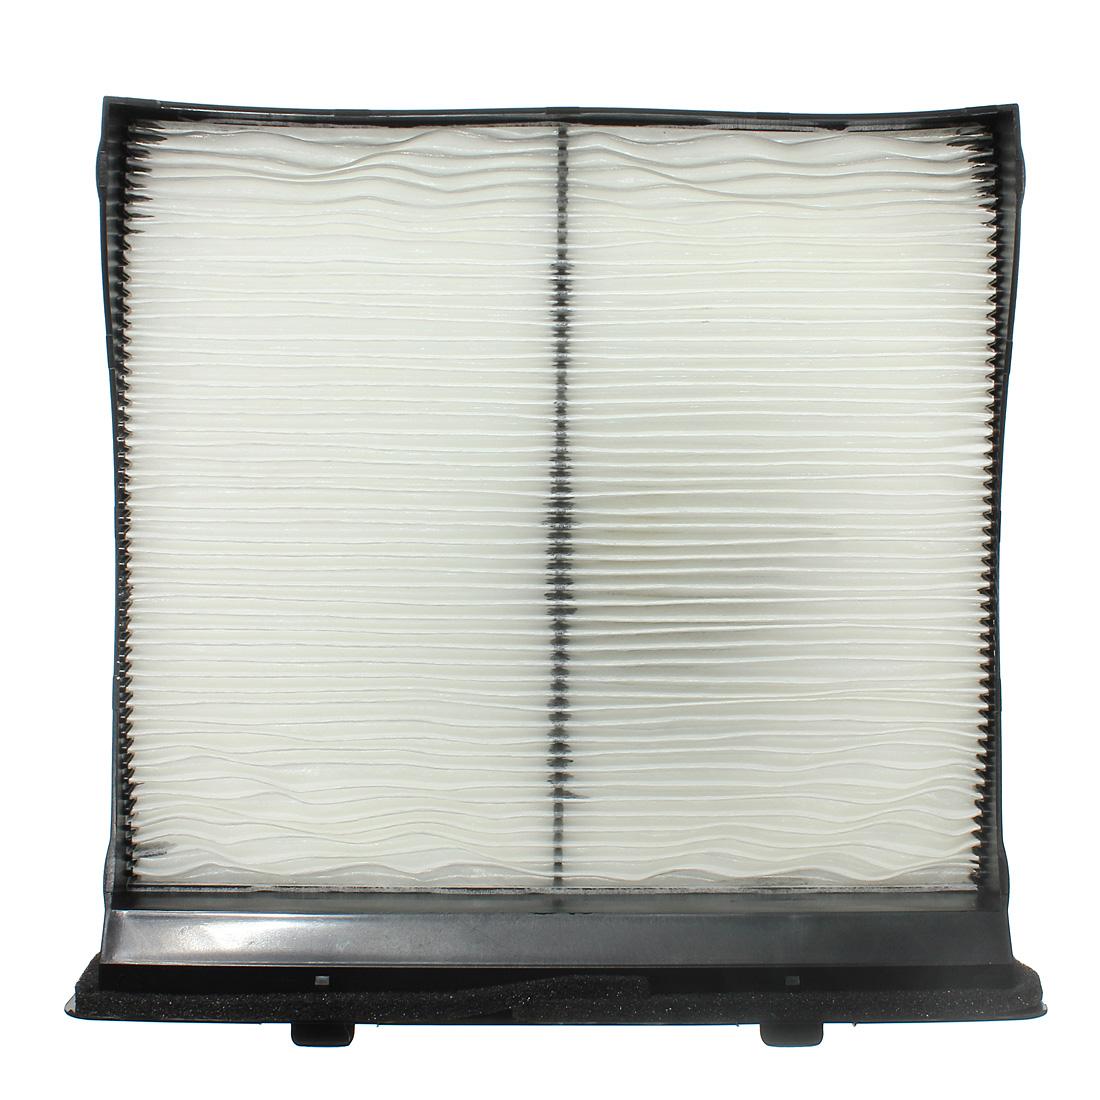 cabin air filter for subaru forester 2009 2010 impreza. Black Bedroom Furniture Sets. Home Design Ideas